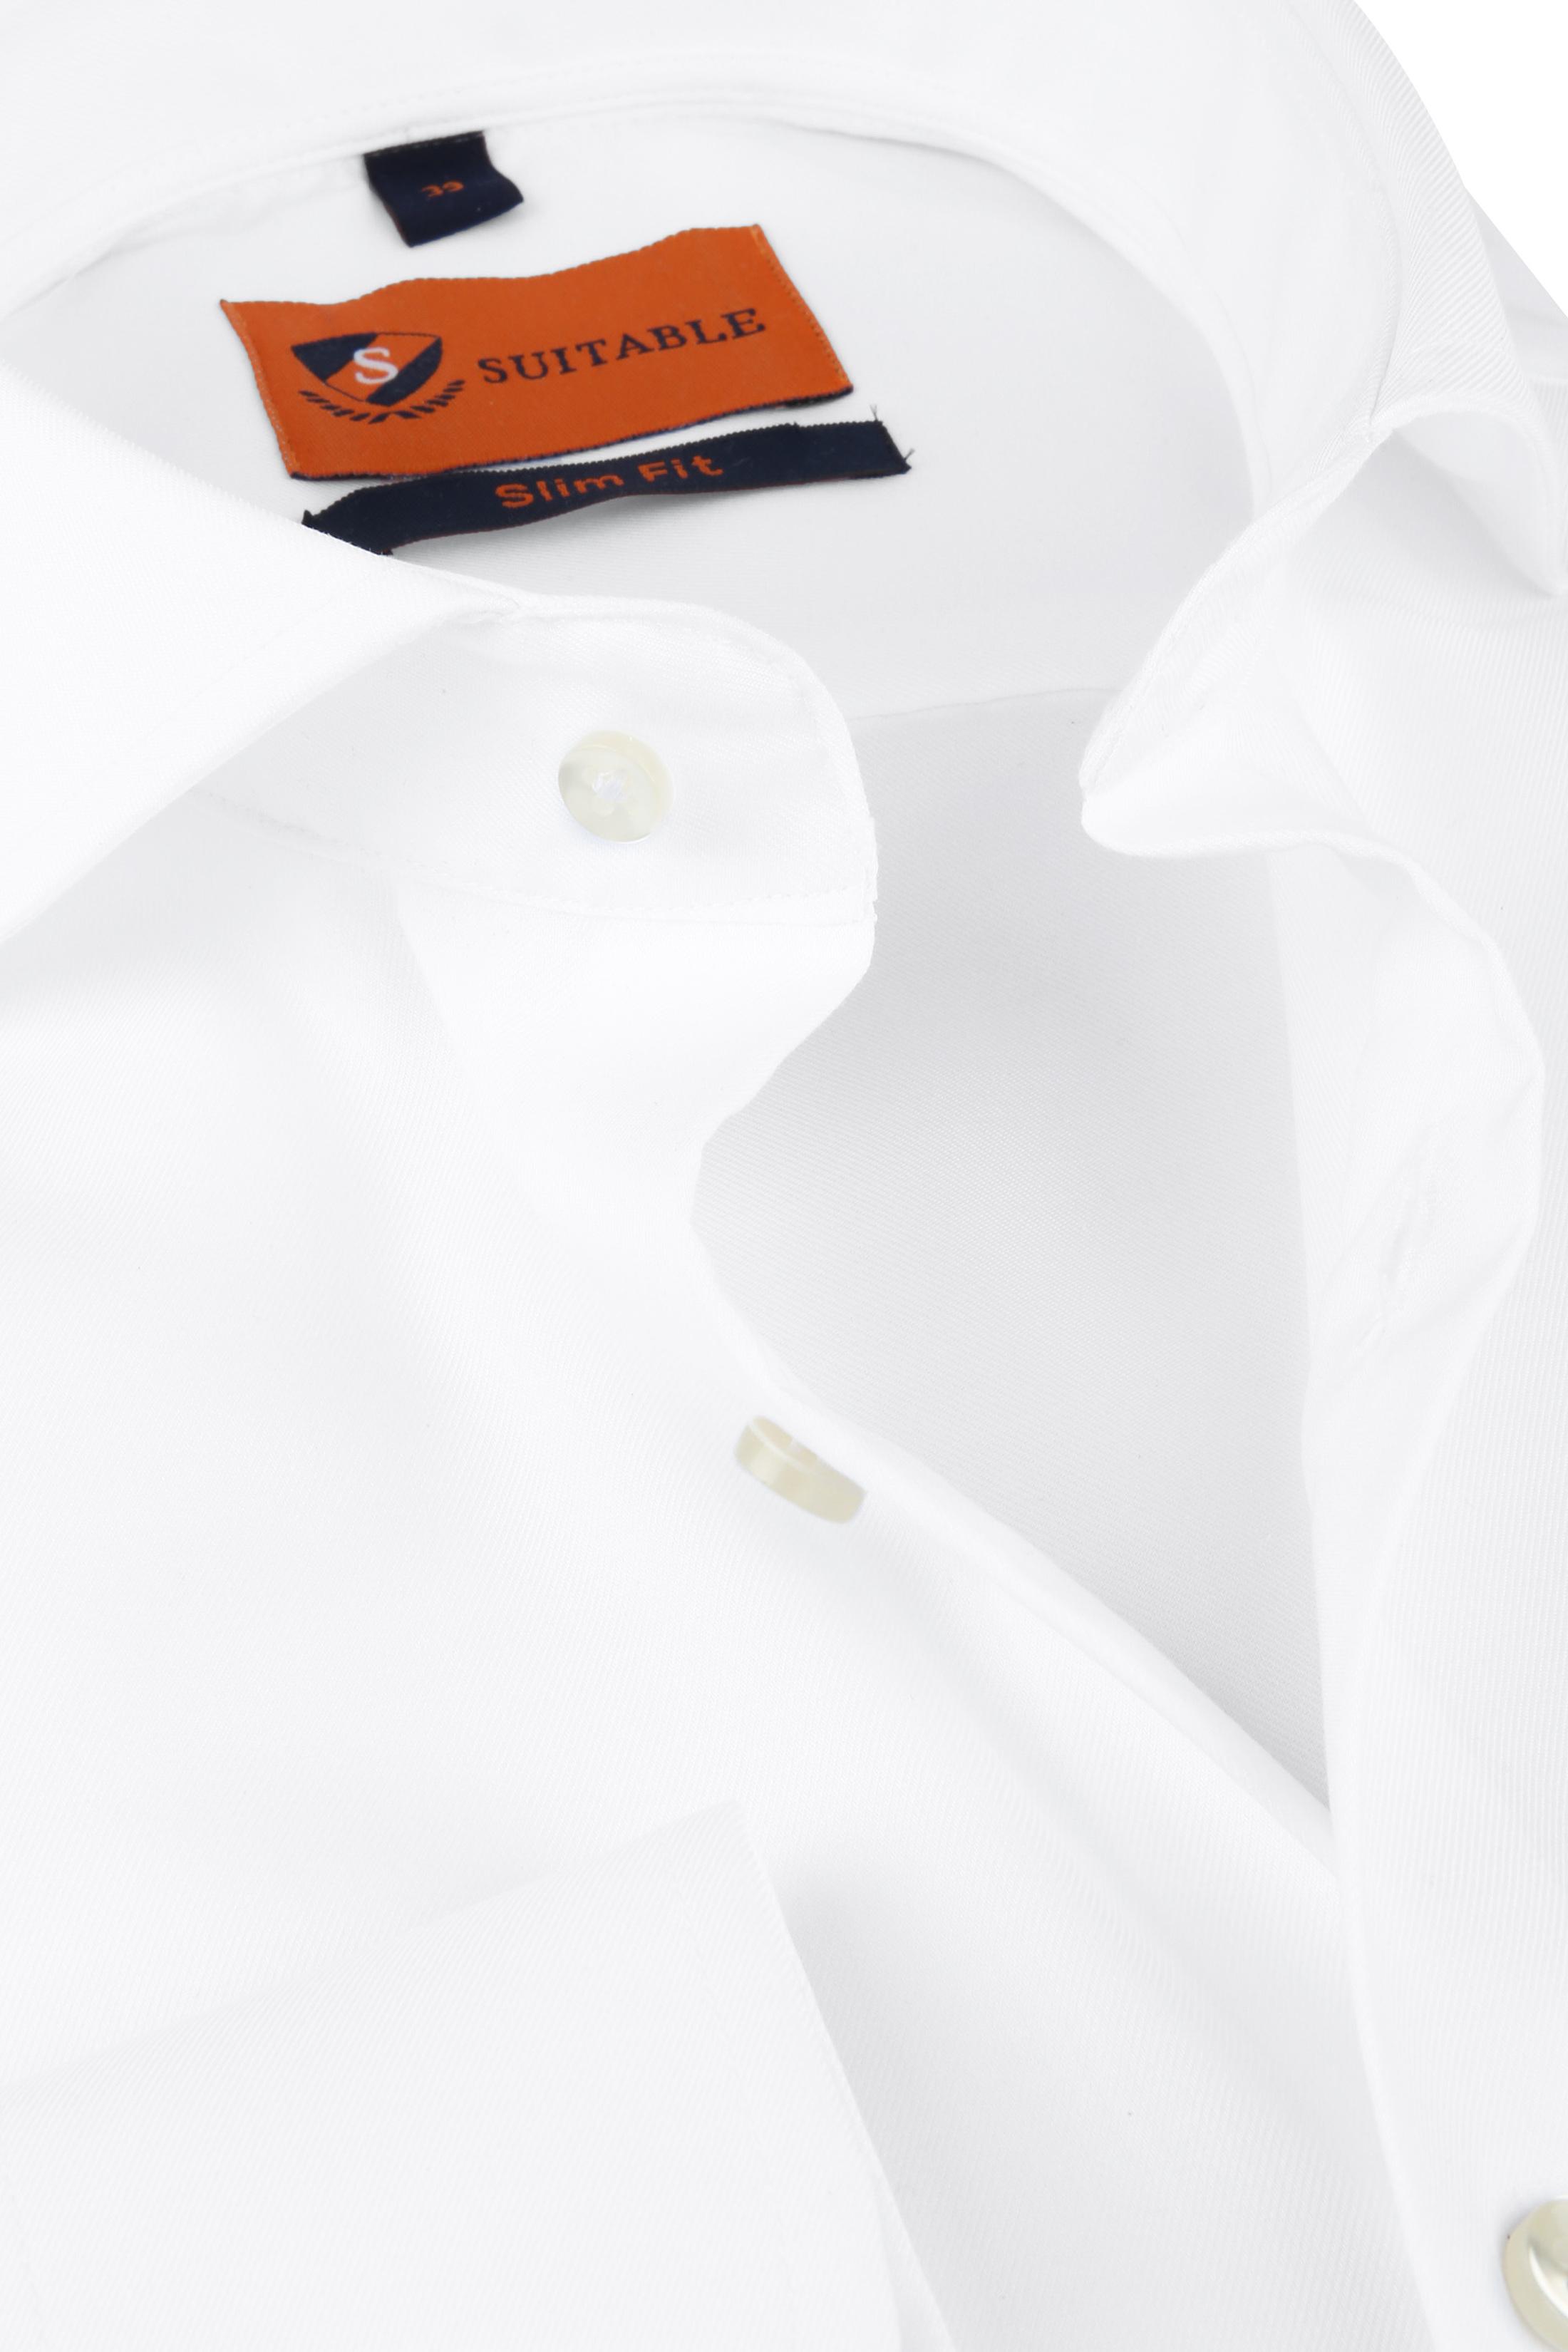 Suitable Overhemd Wit 146-7 foto 1